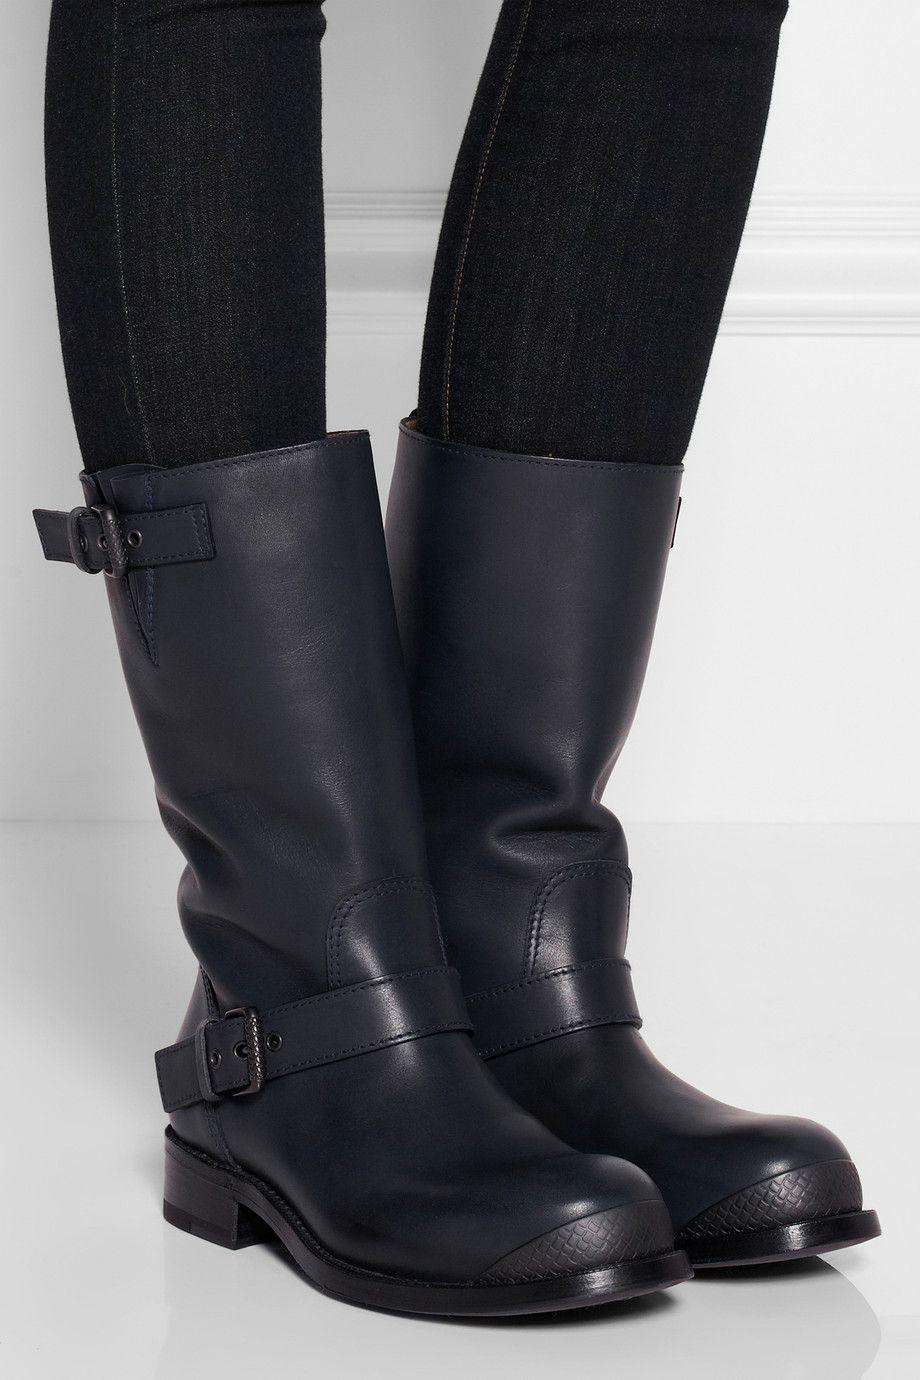 bottega veneta leather biker boots net a porter com fashion rh pinterest com